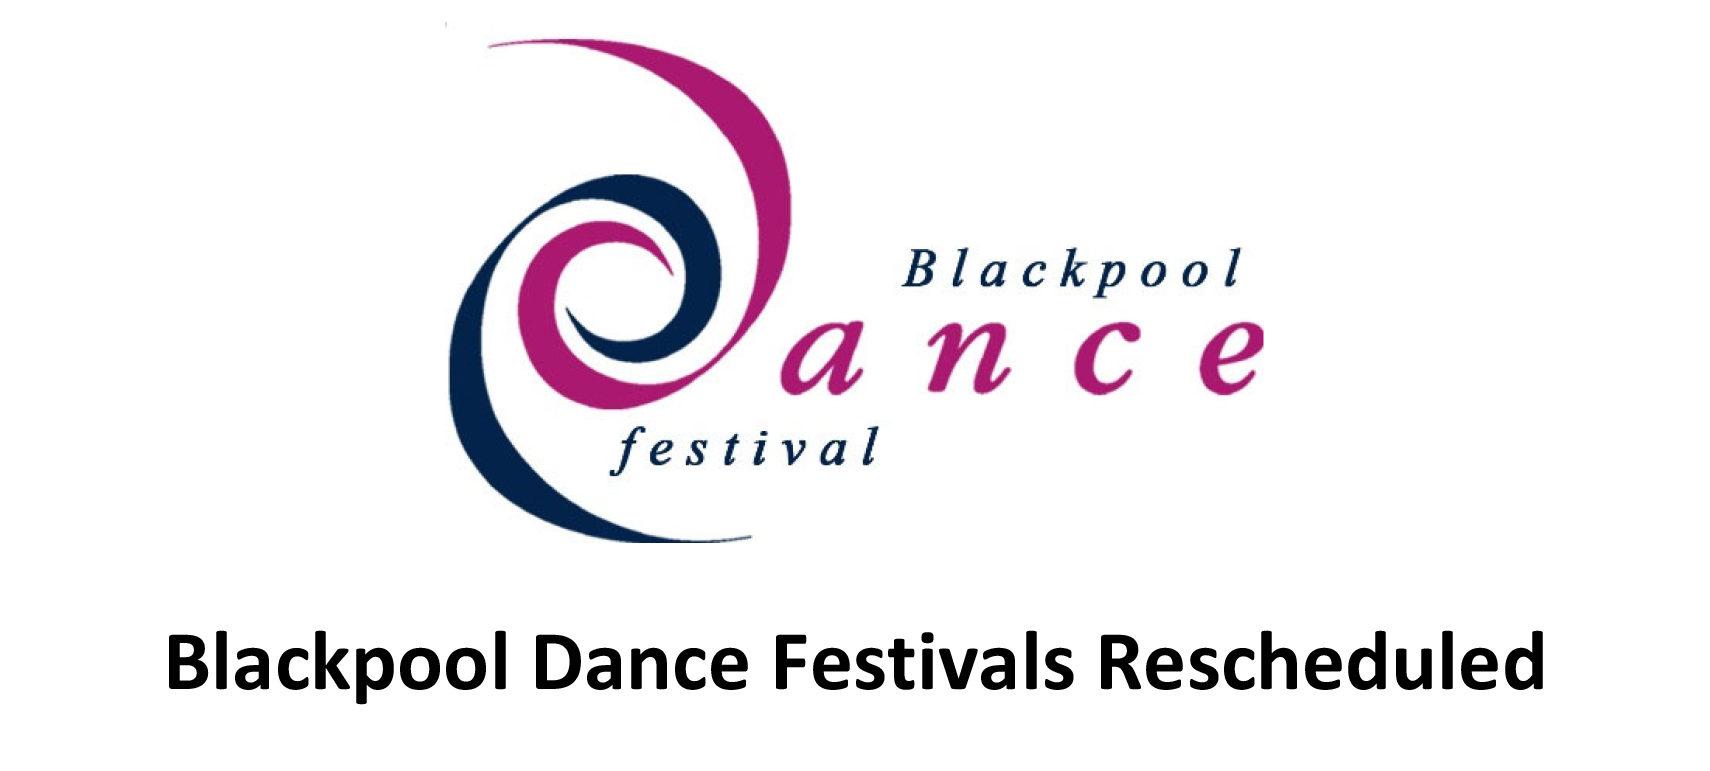 Blackpool Dance Festival 2020 Press Release